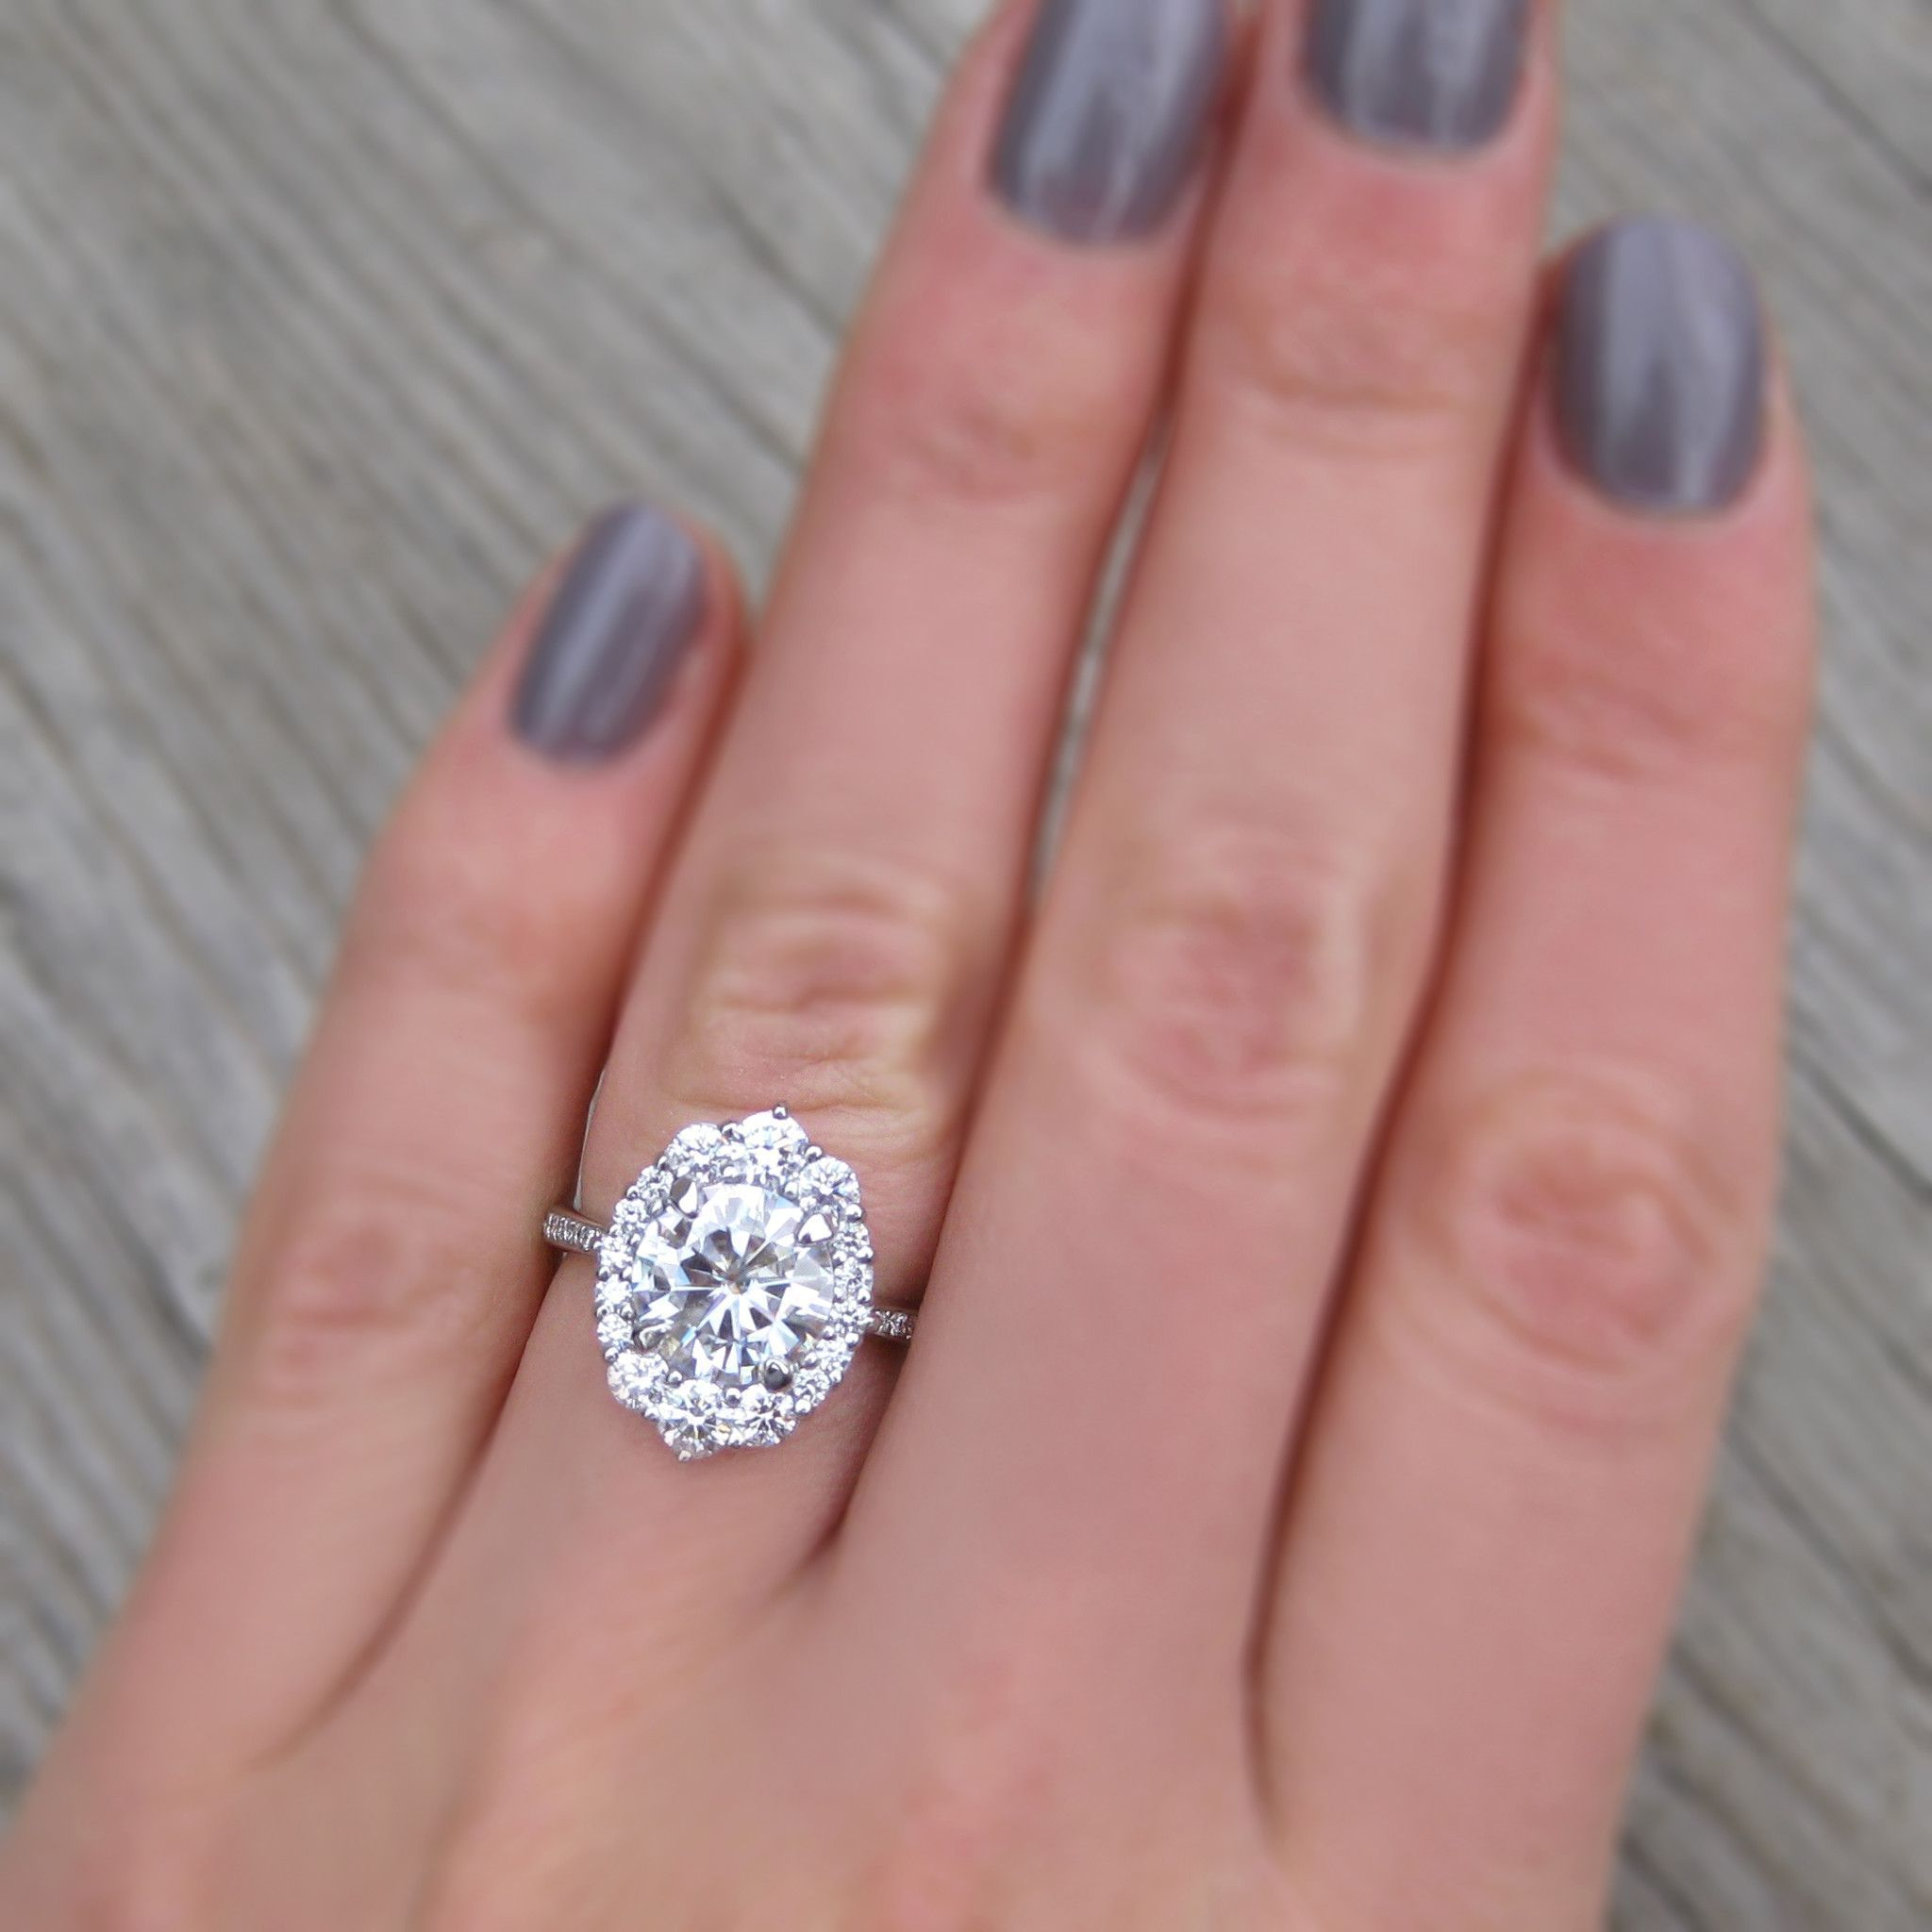 Forever one or supernova moissanite engagement ring with diamond